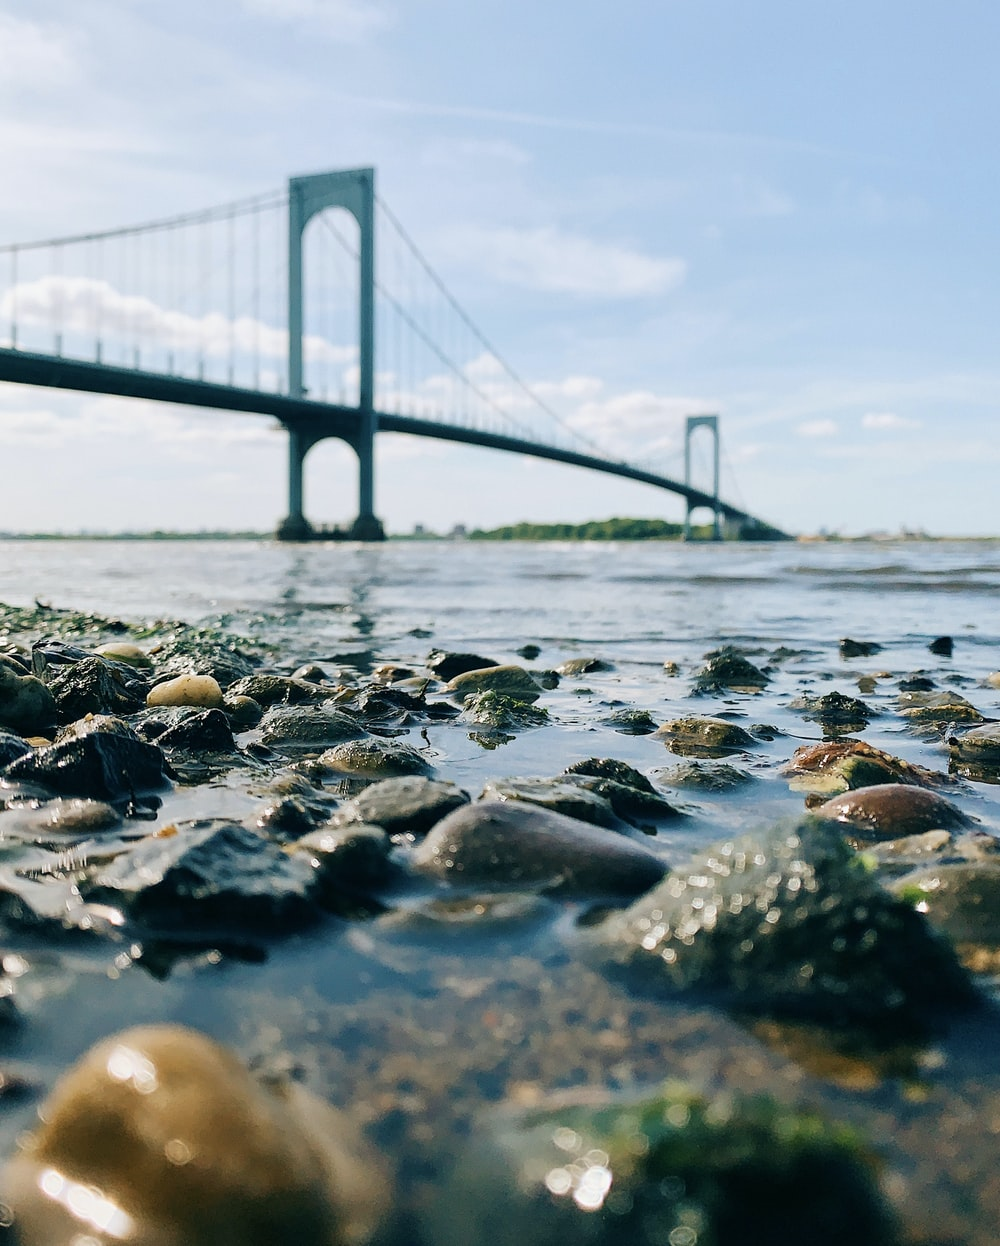 gray rocks on beach shore during daytime